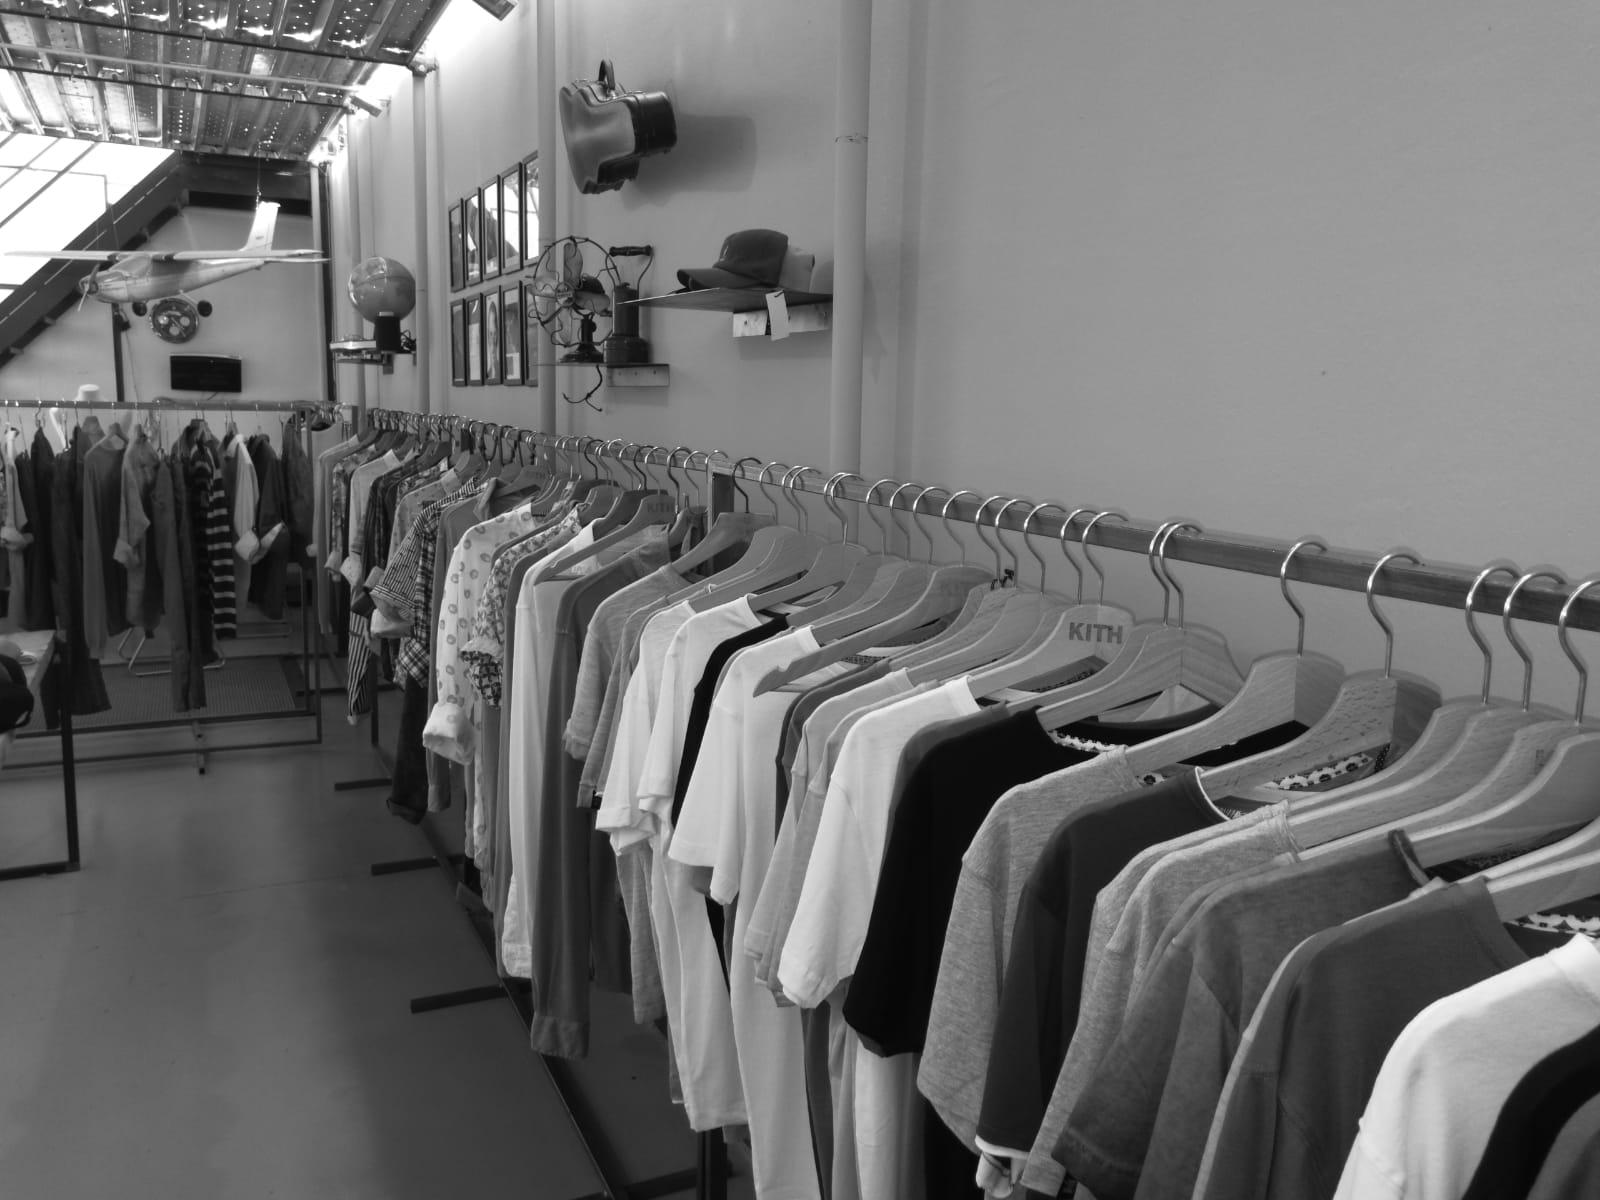 showroom_areab2